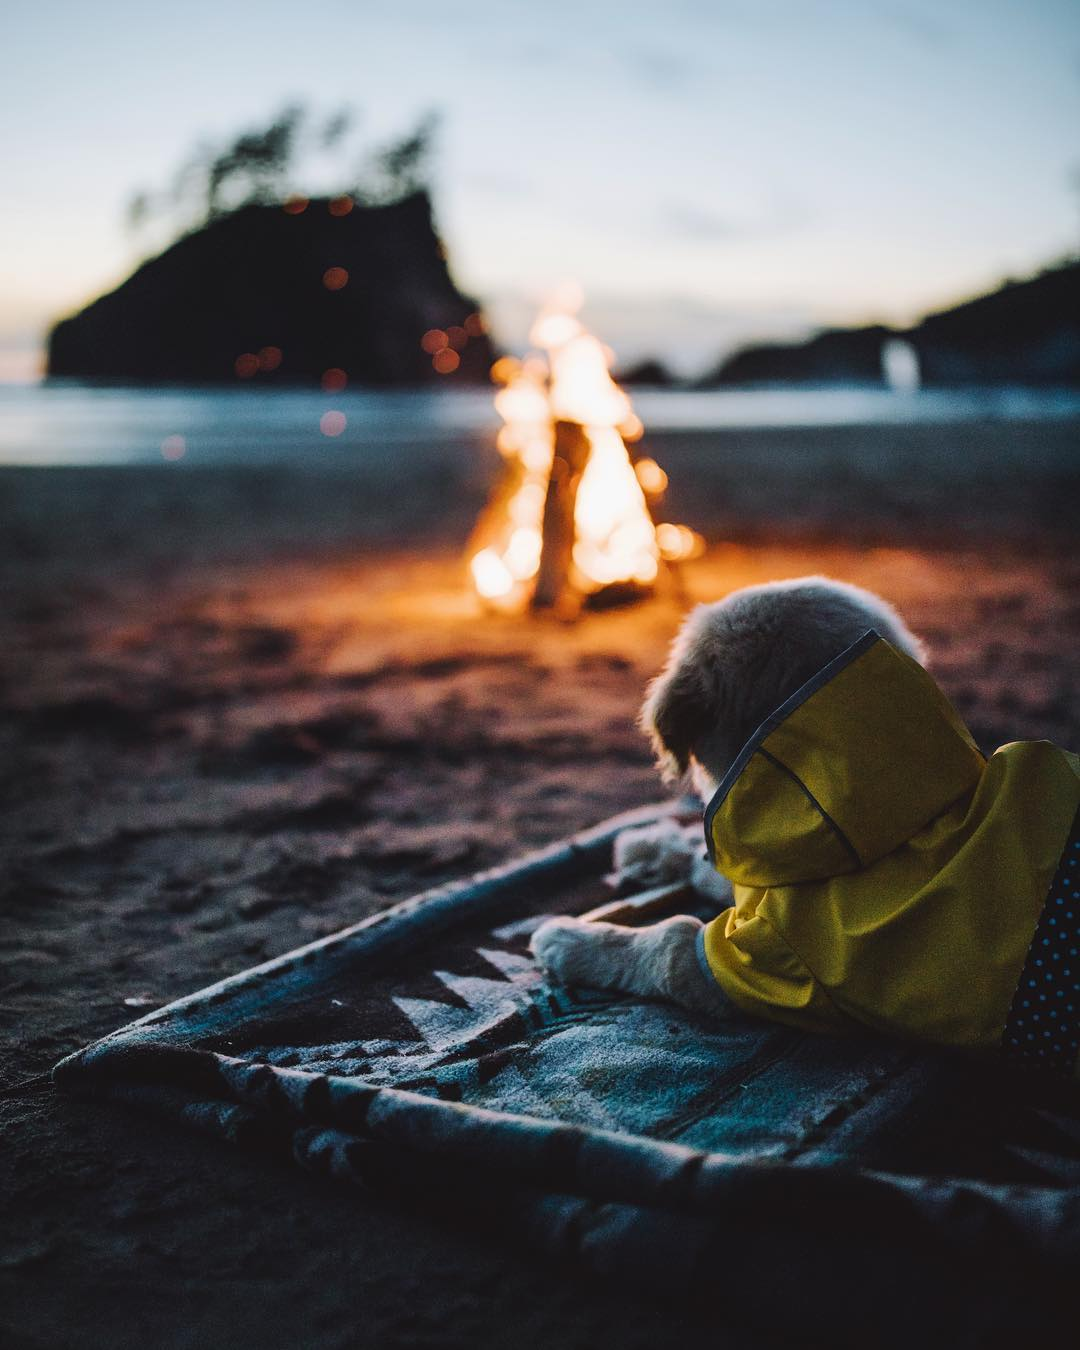 Путешествия и приключения на снимках Кэмерона Андерсона